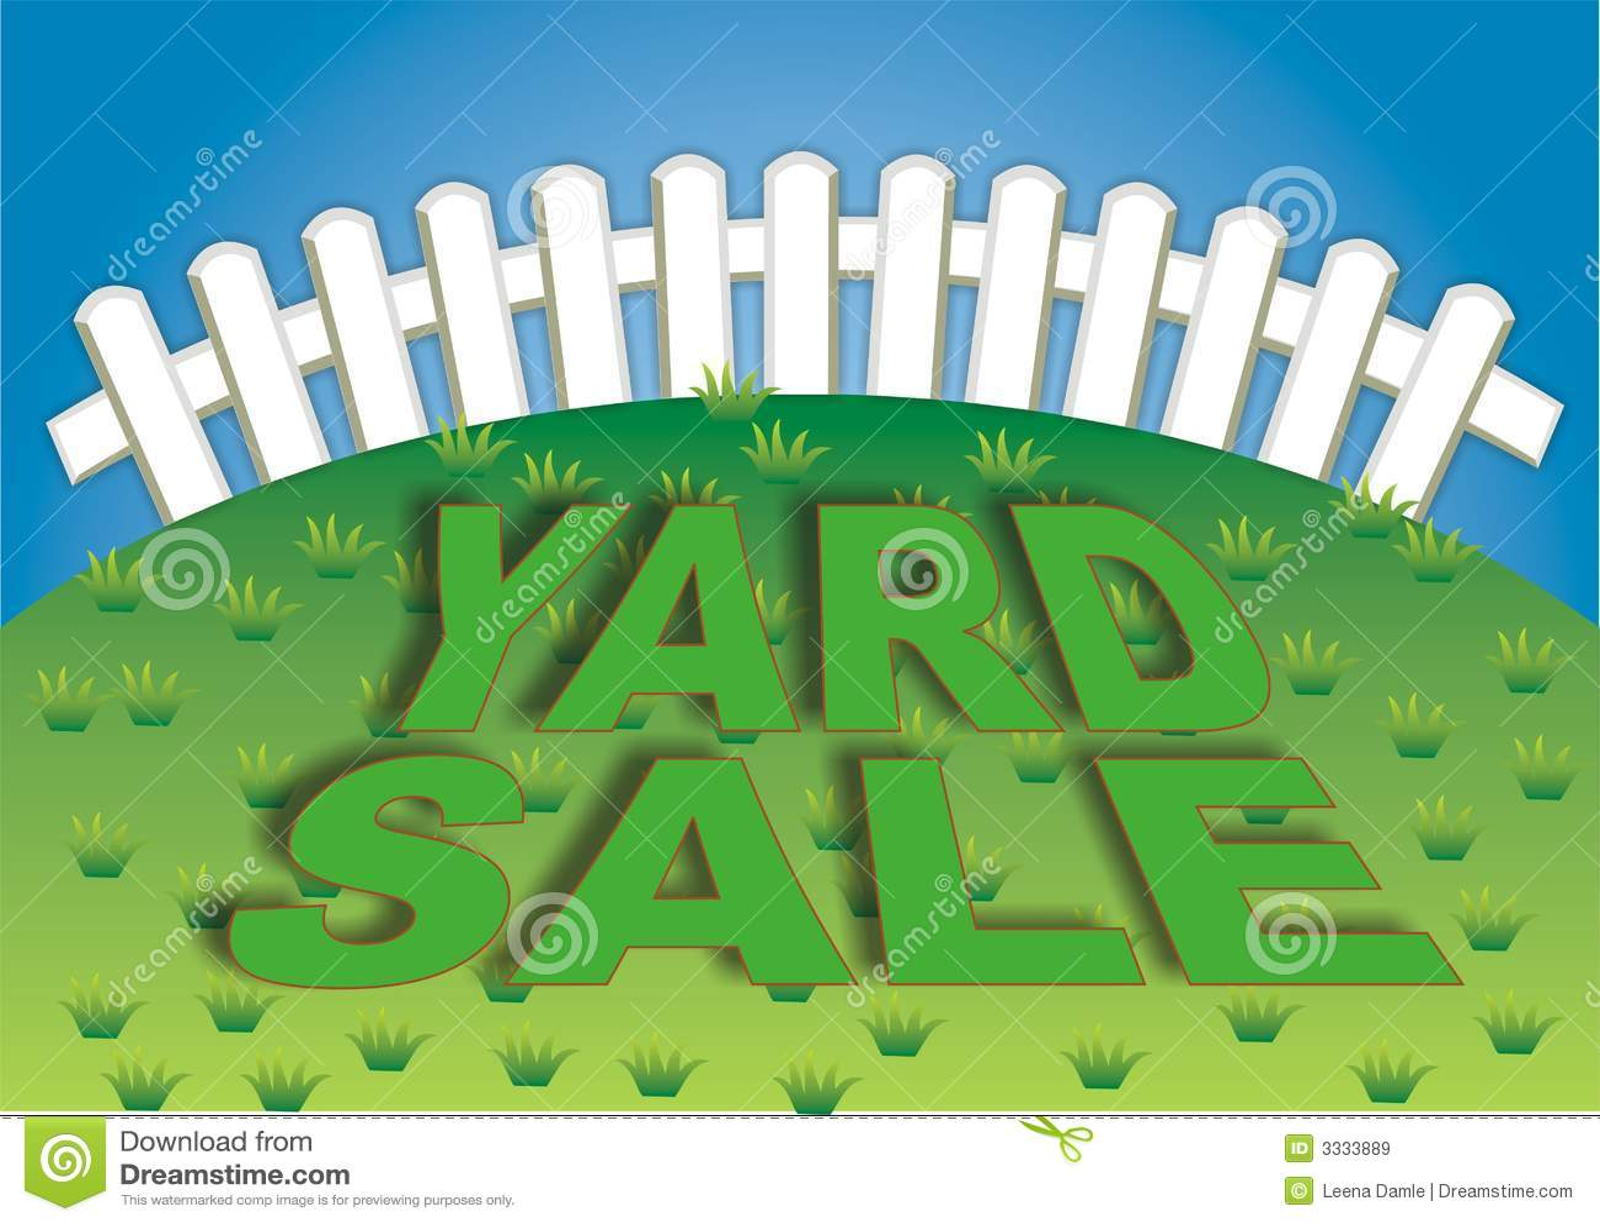 yard sale images free